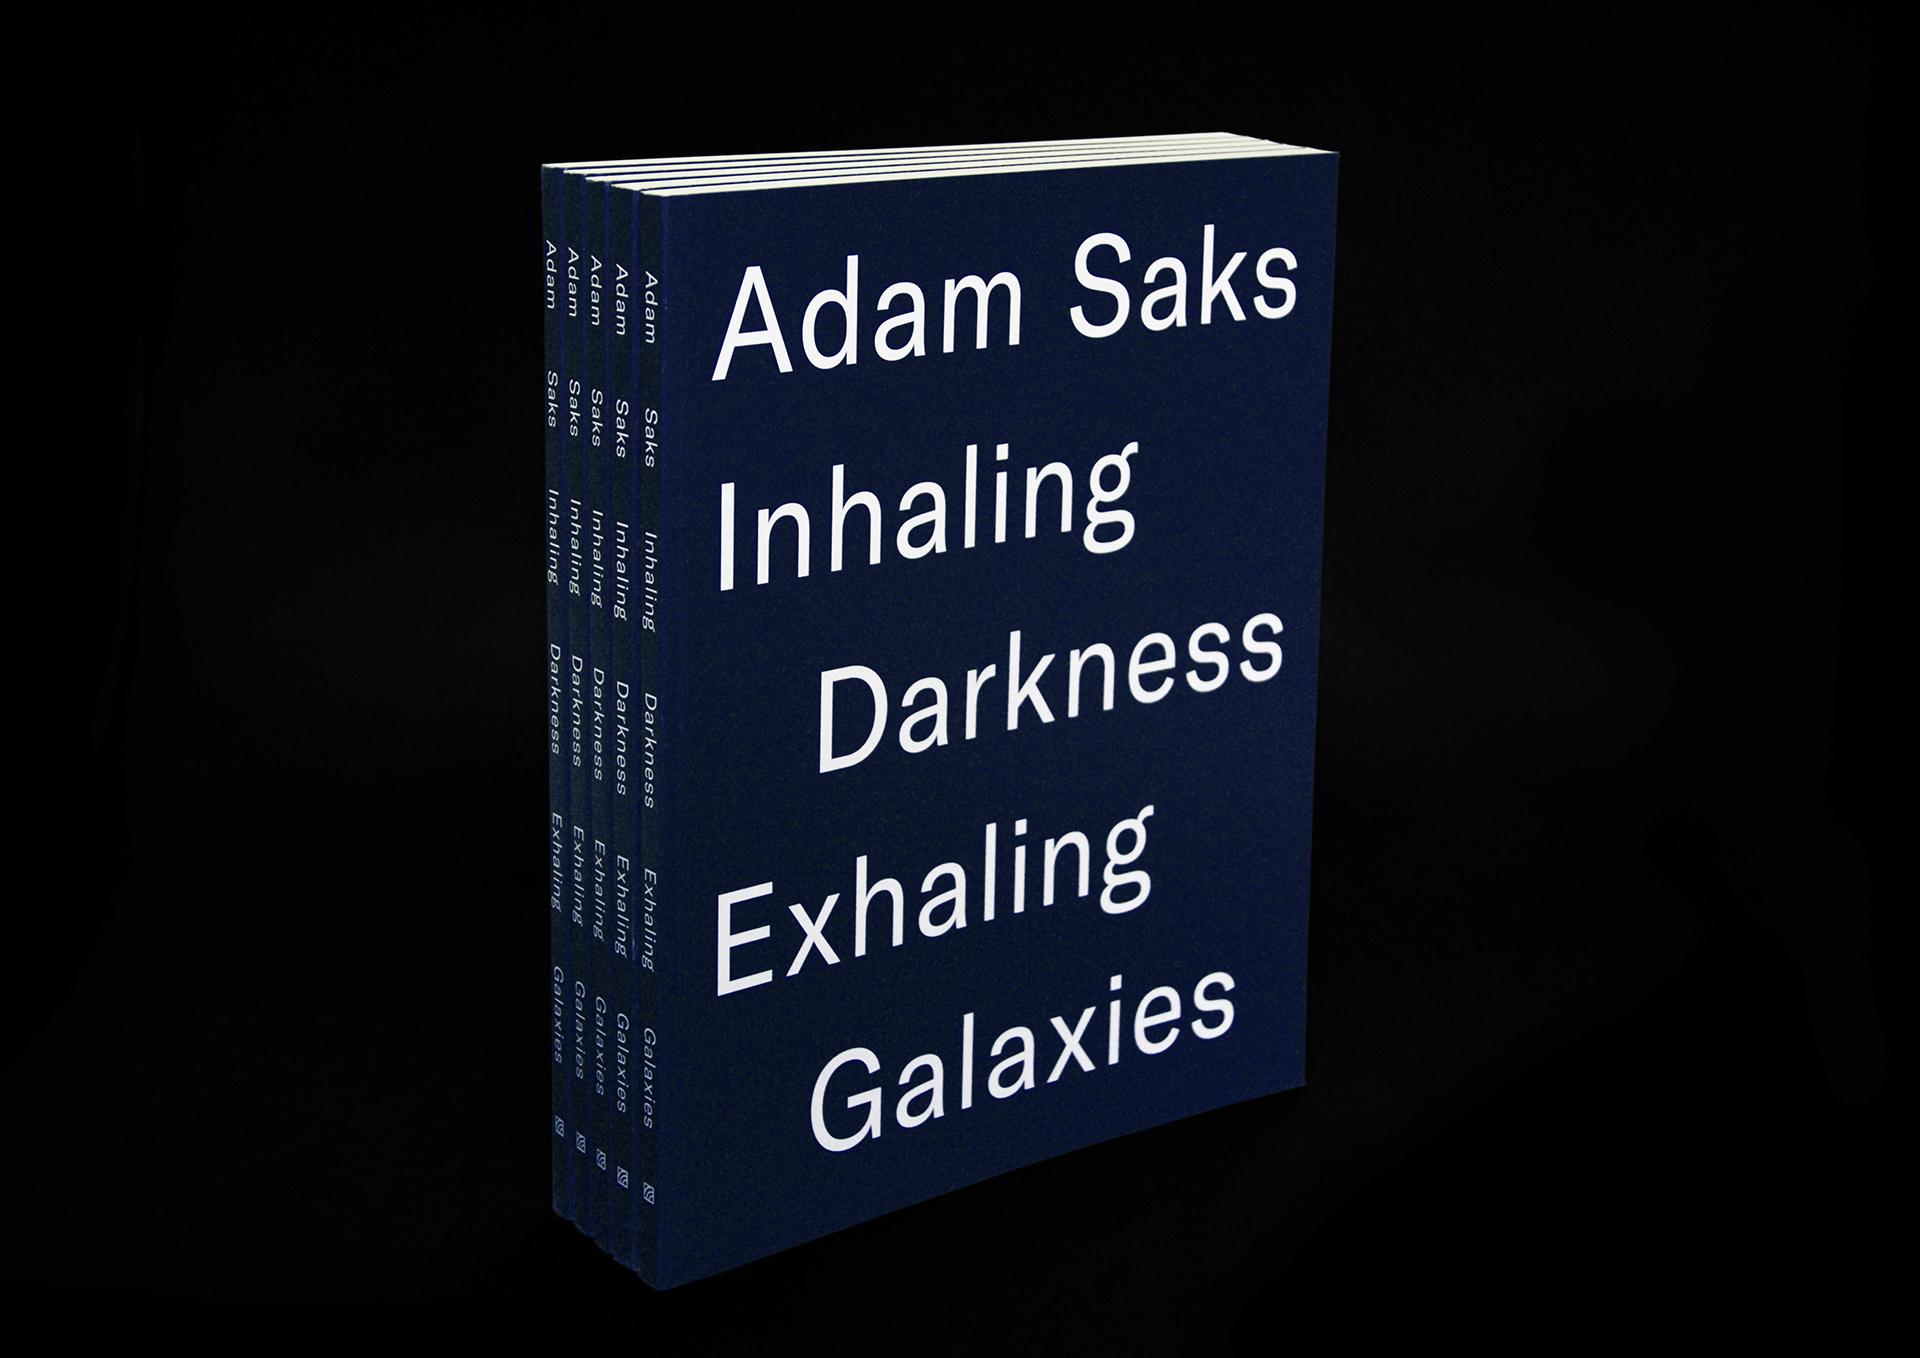 Adam Saks